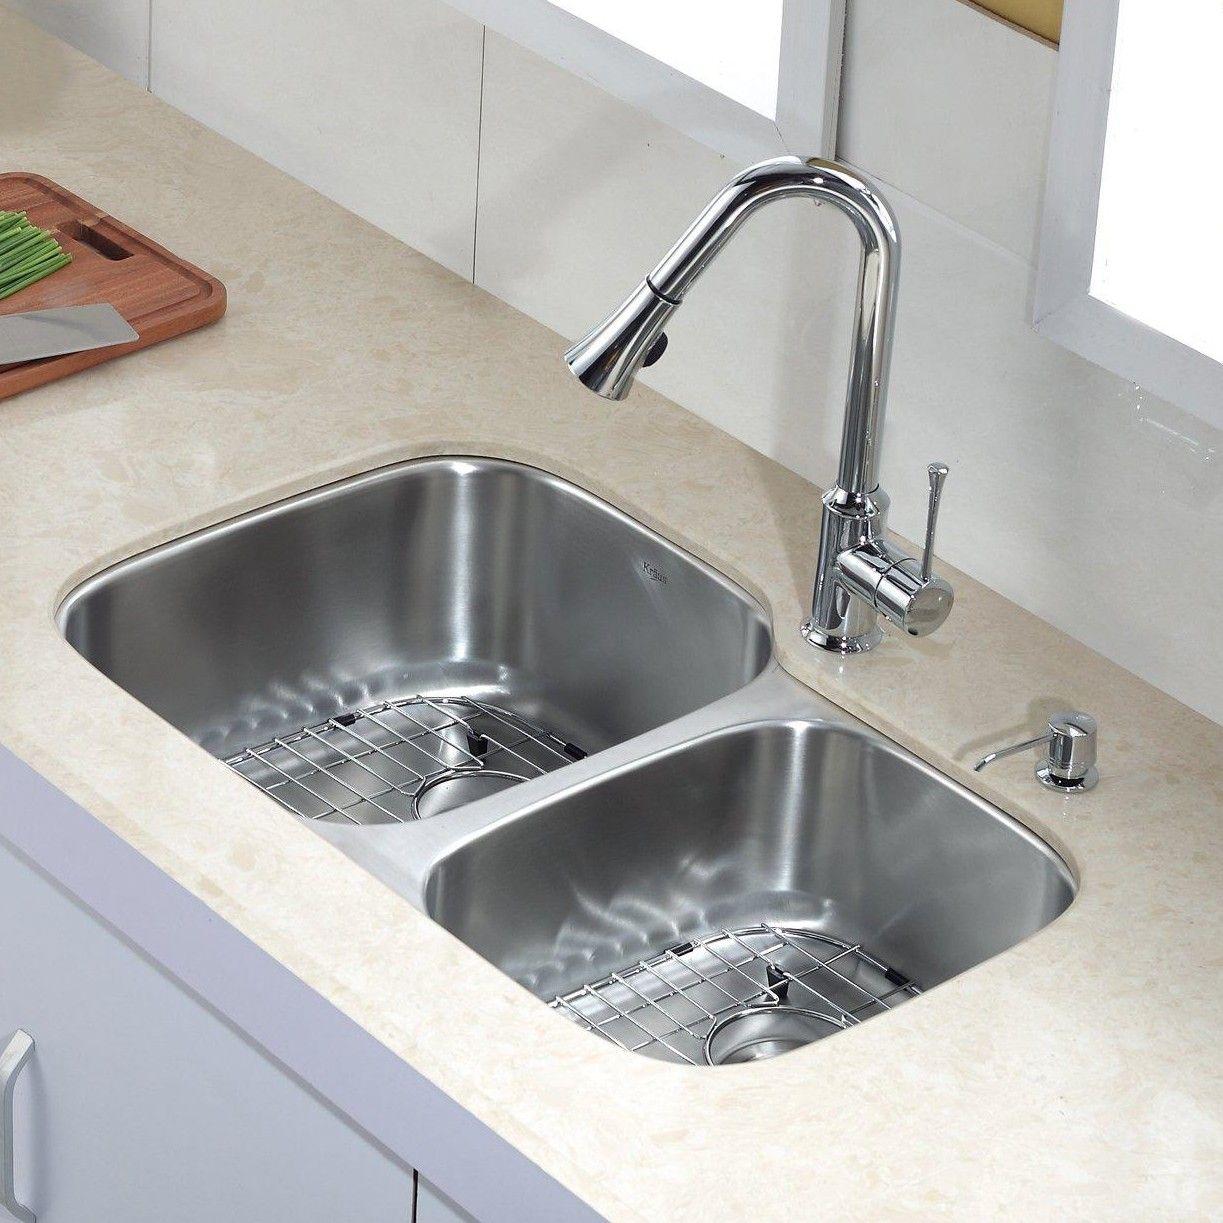 Kitchen Combos 32 X 20 75 Double Bowl Undermount Kitchen Sink